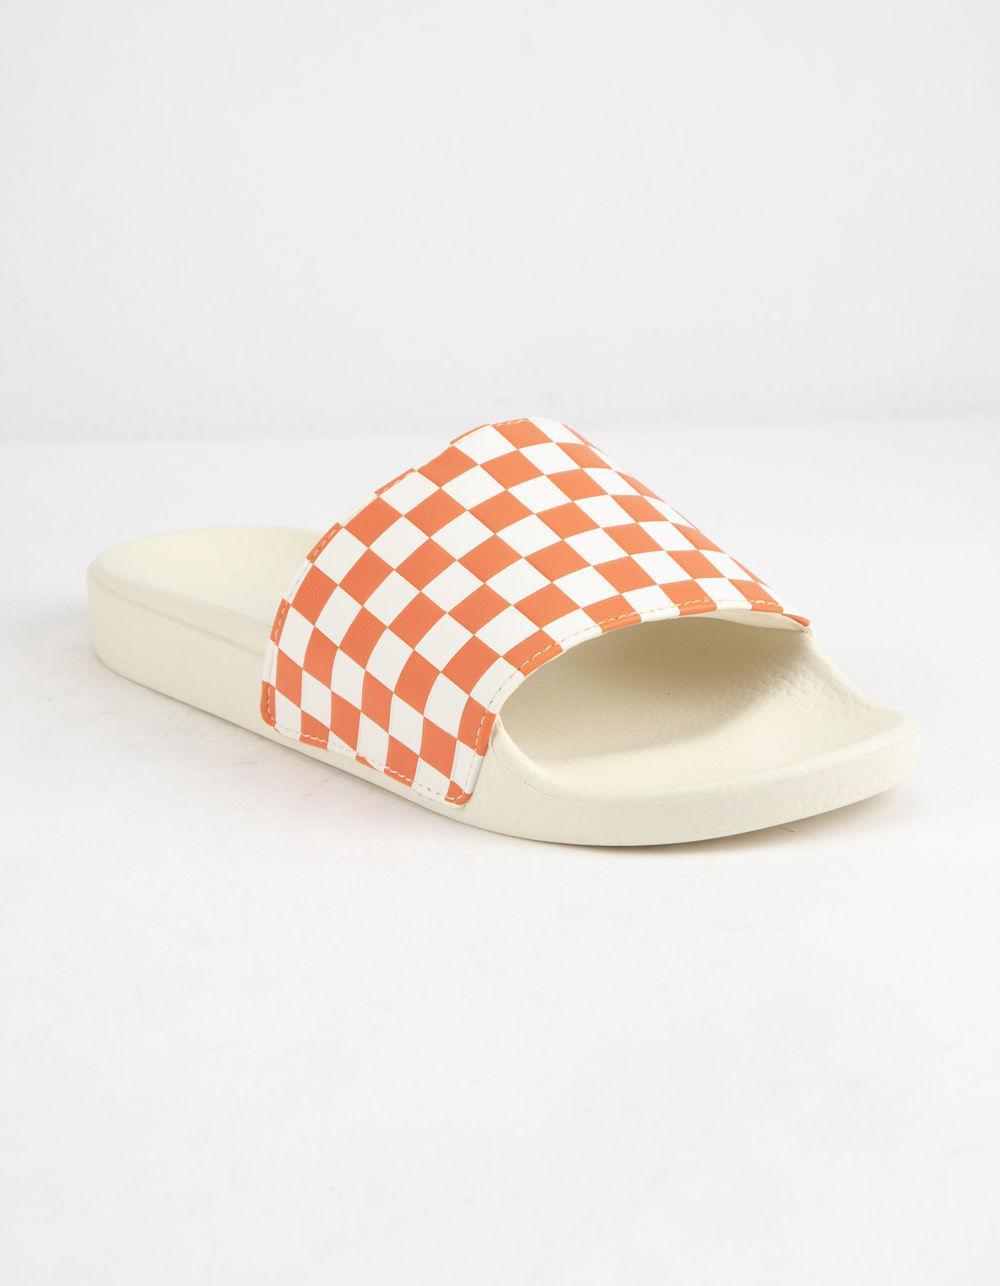 d1657cefe9a1f8 Lyst - Vans Checkered Rust Womens Slide Sandals - Save 41%